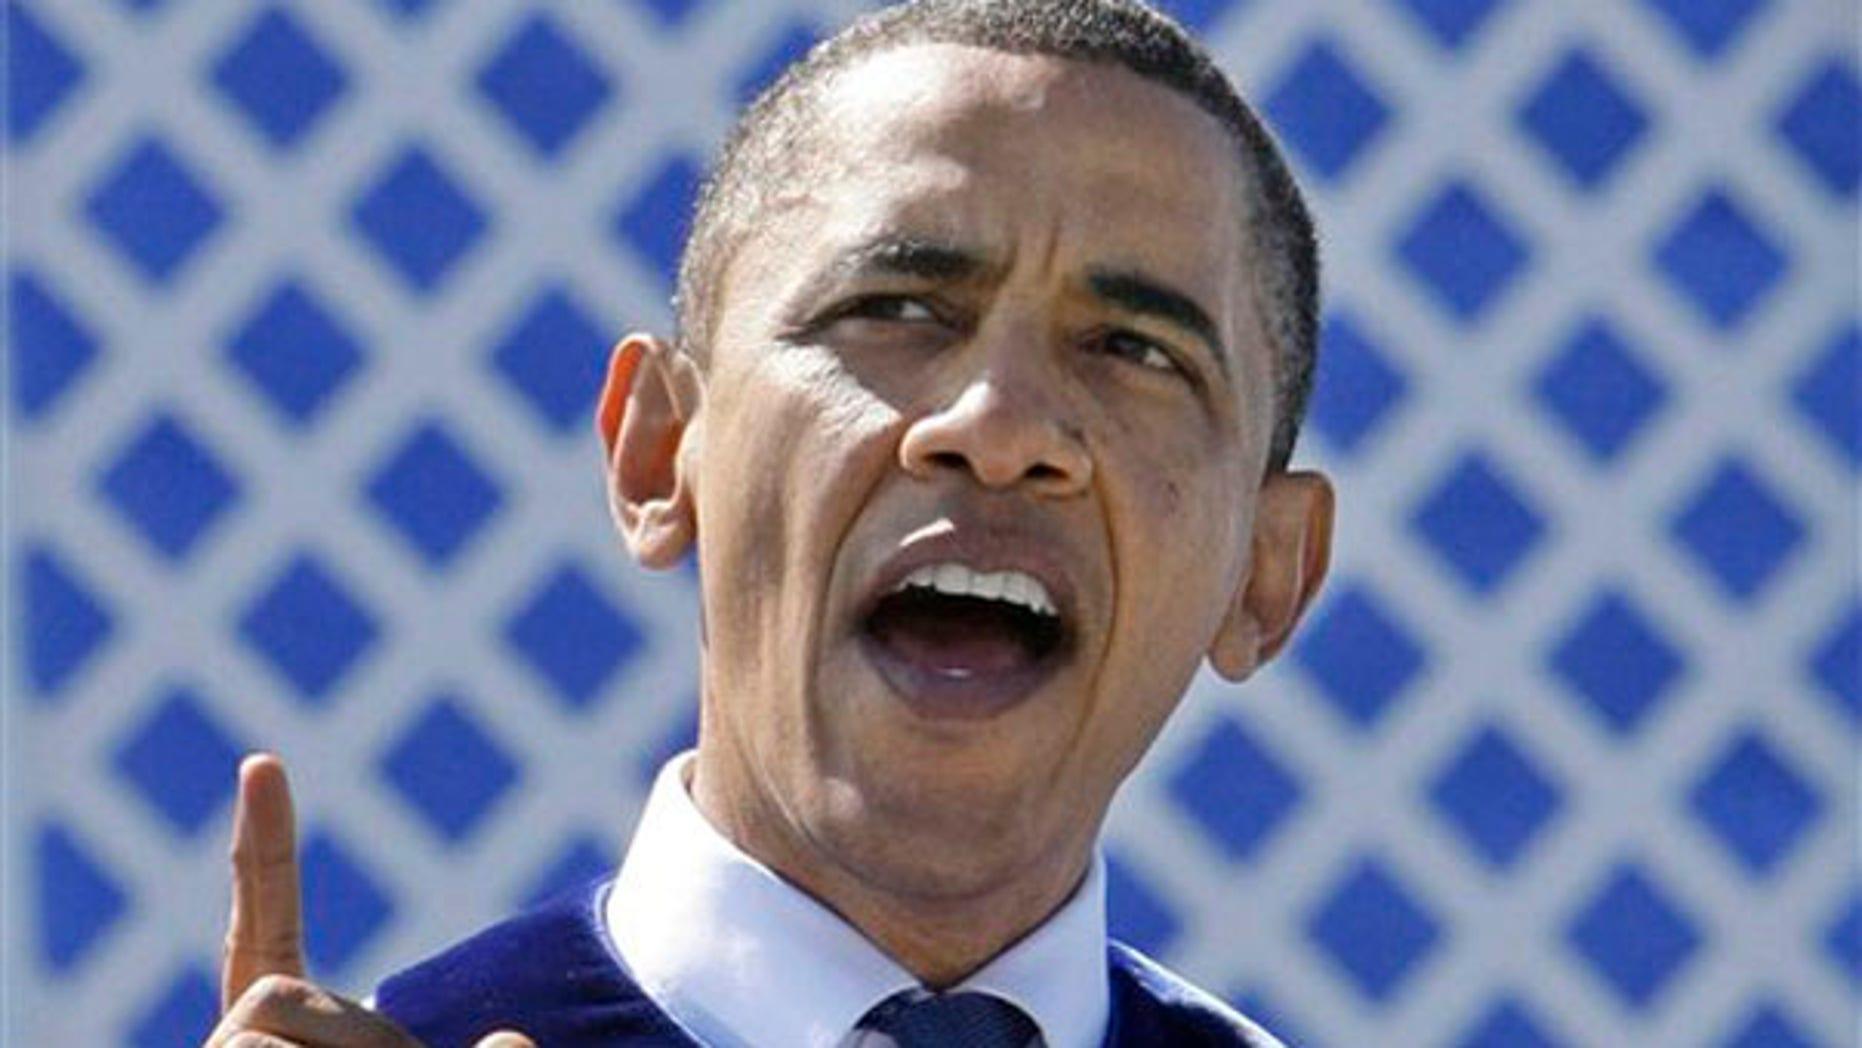 President Obama addresses graduates of Hampton University in Hampton, Va., May 9. (AP Photo)